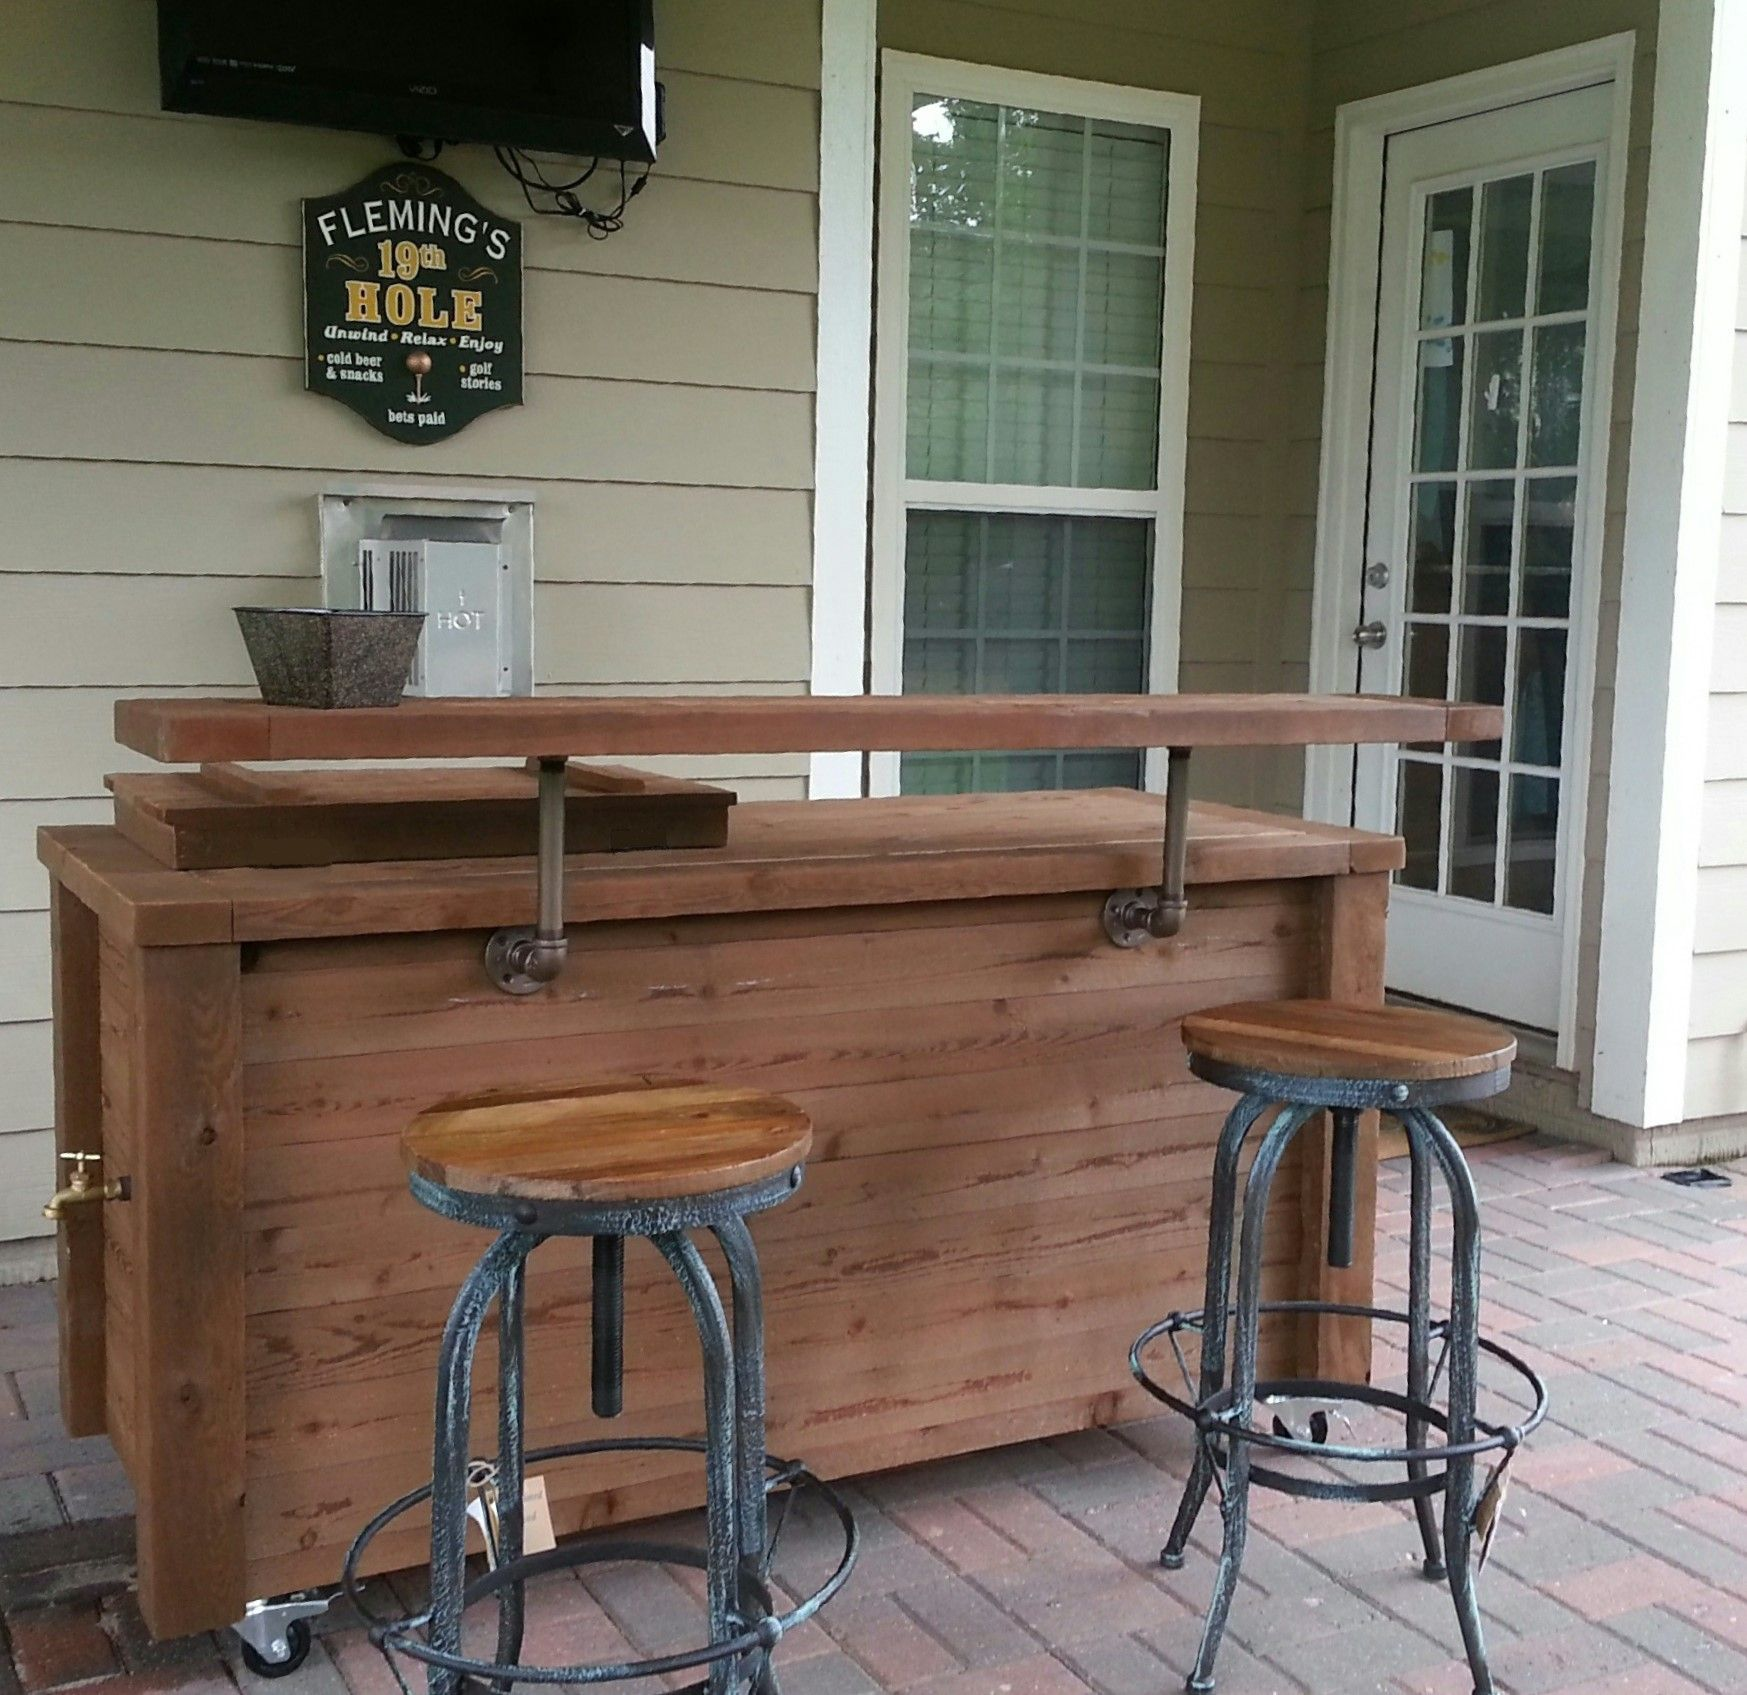 Outdoor Cooler Bar And Cabinet Scheduled Via Http Www Tailwindapp Com Utm Source Pinterest Utm Outdoor Patio Bar Bar Height Patio Furniture Diy Outdoor Bar